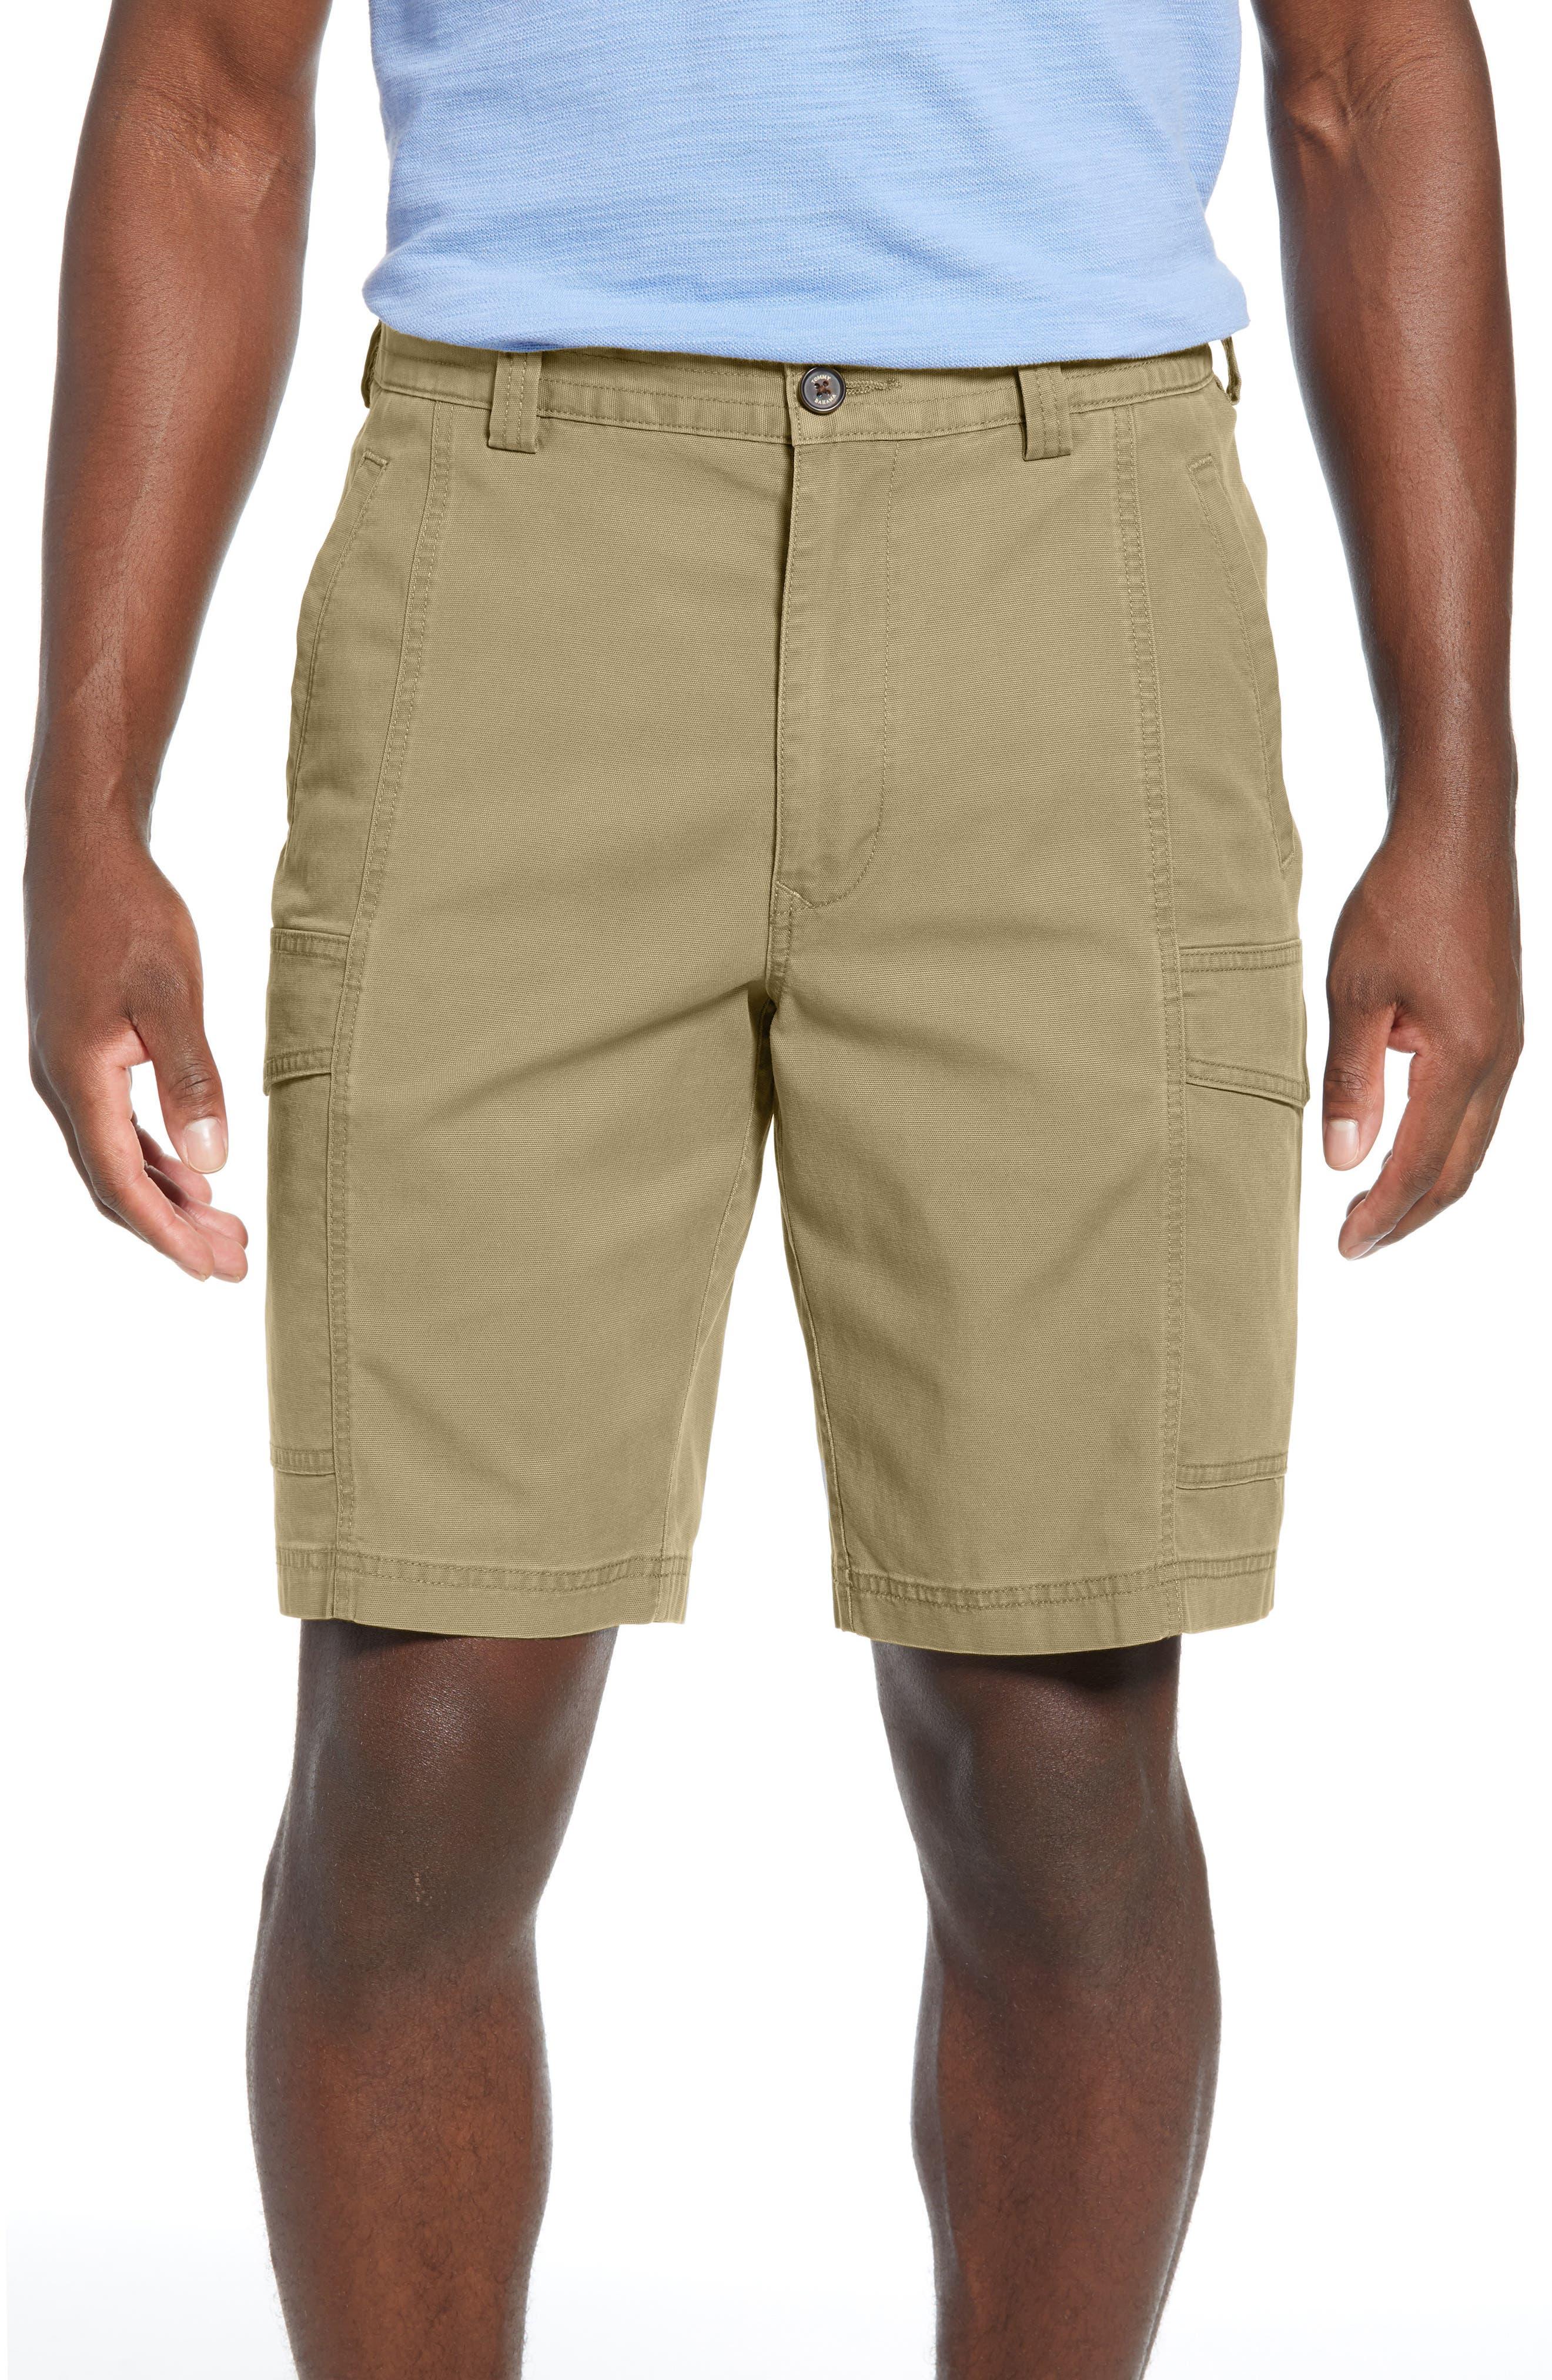 Key Isles Shorts,                             Main thumbnail 1, color,                             Khaki